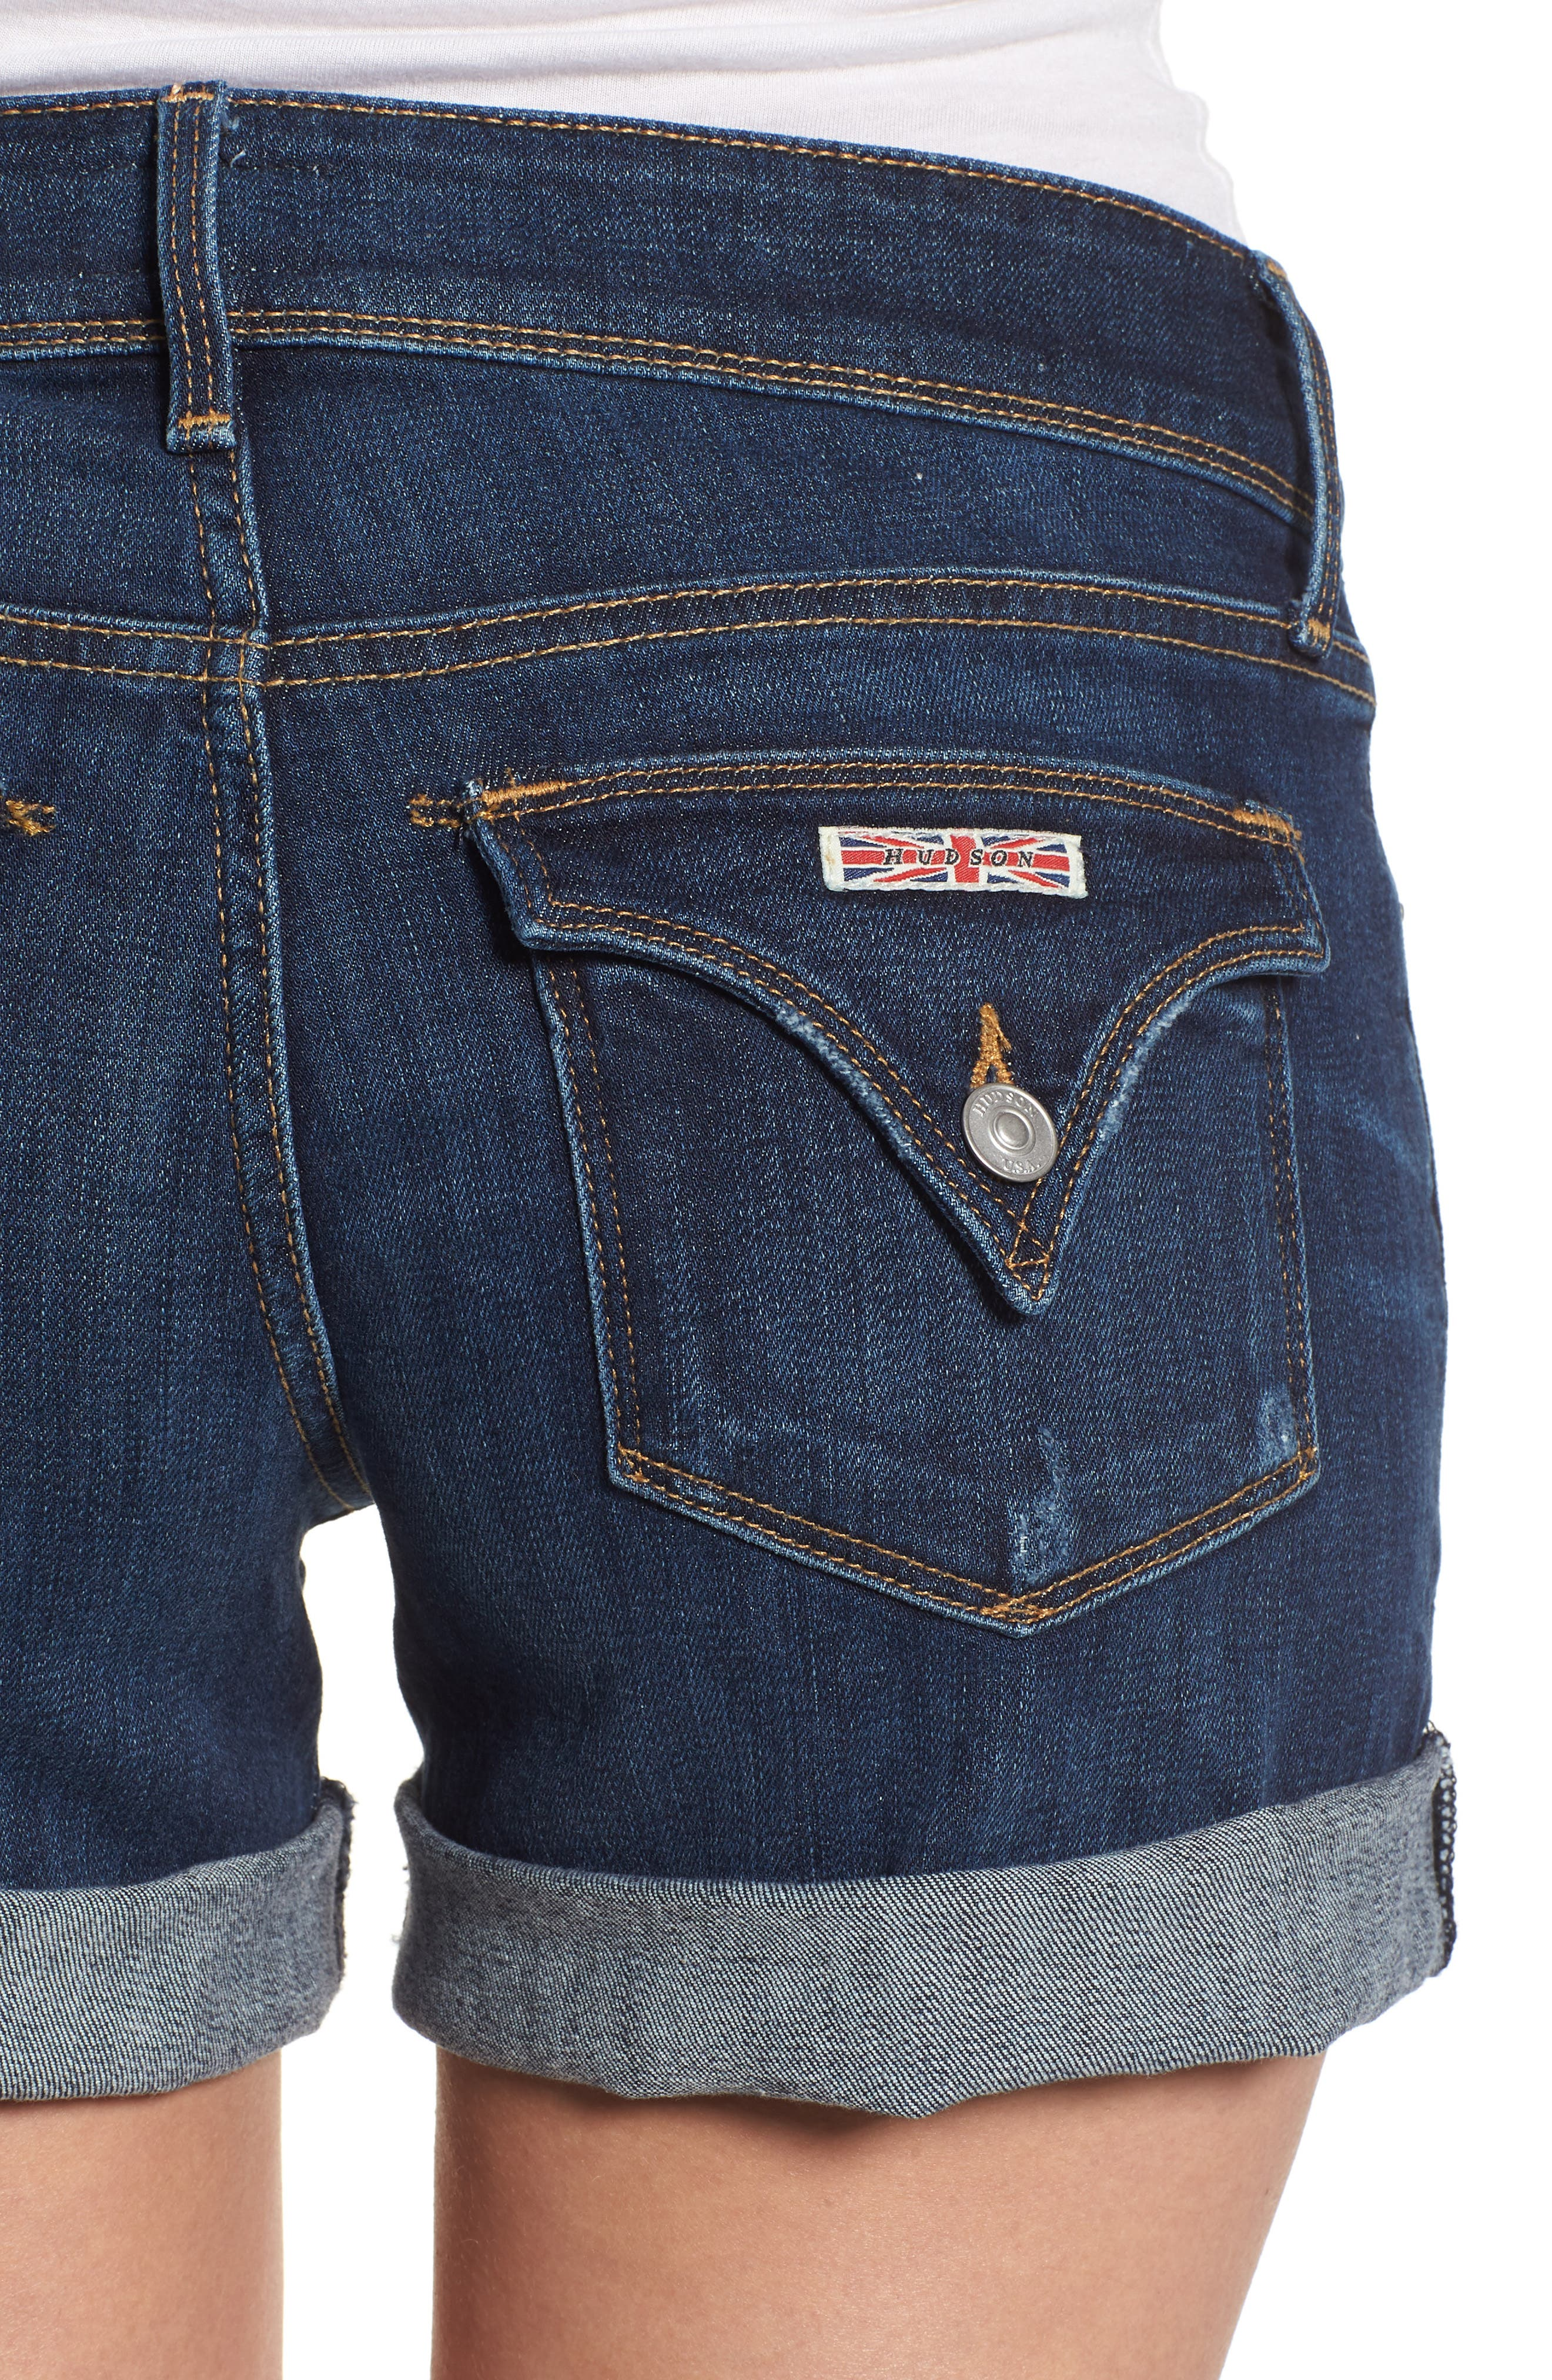 Croxley Cuffed Denim Shorts,                             Alternate thumbnail 4, color,                             423